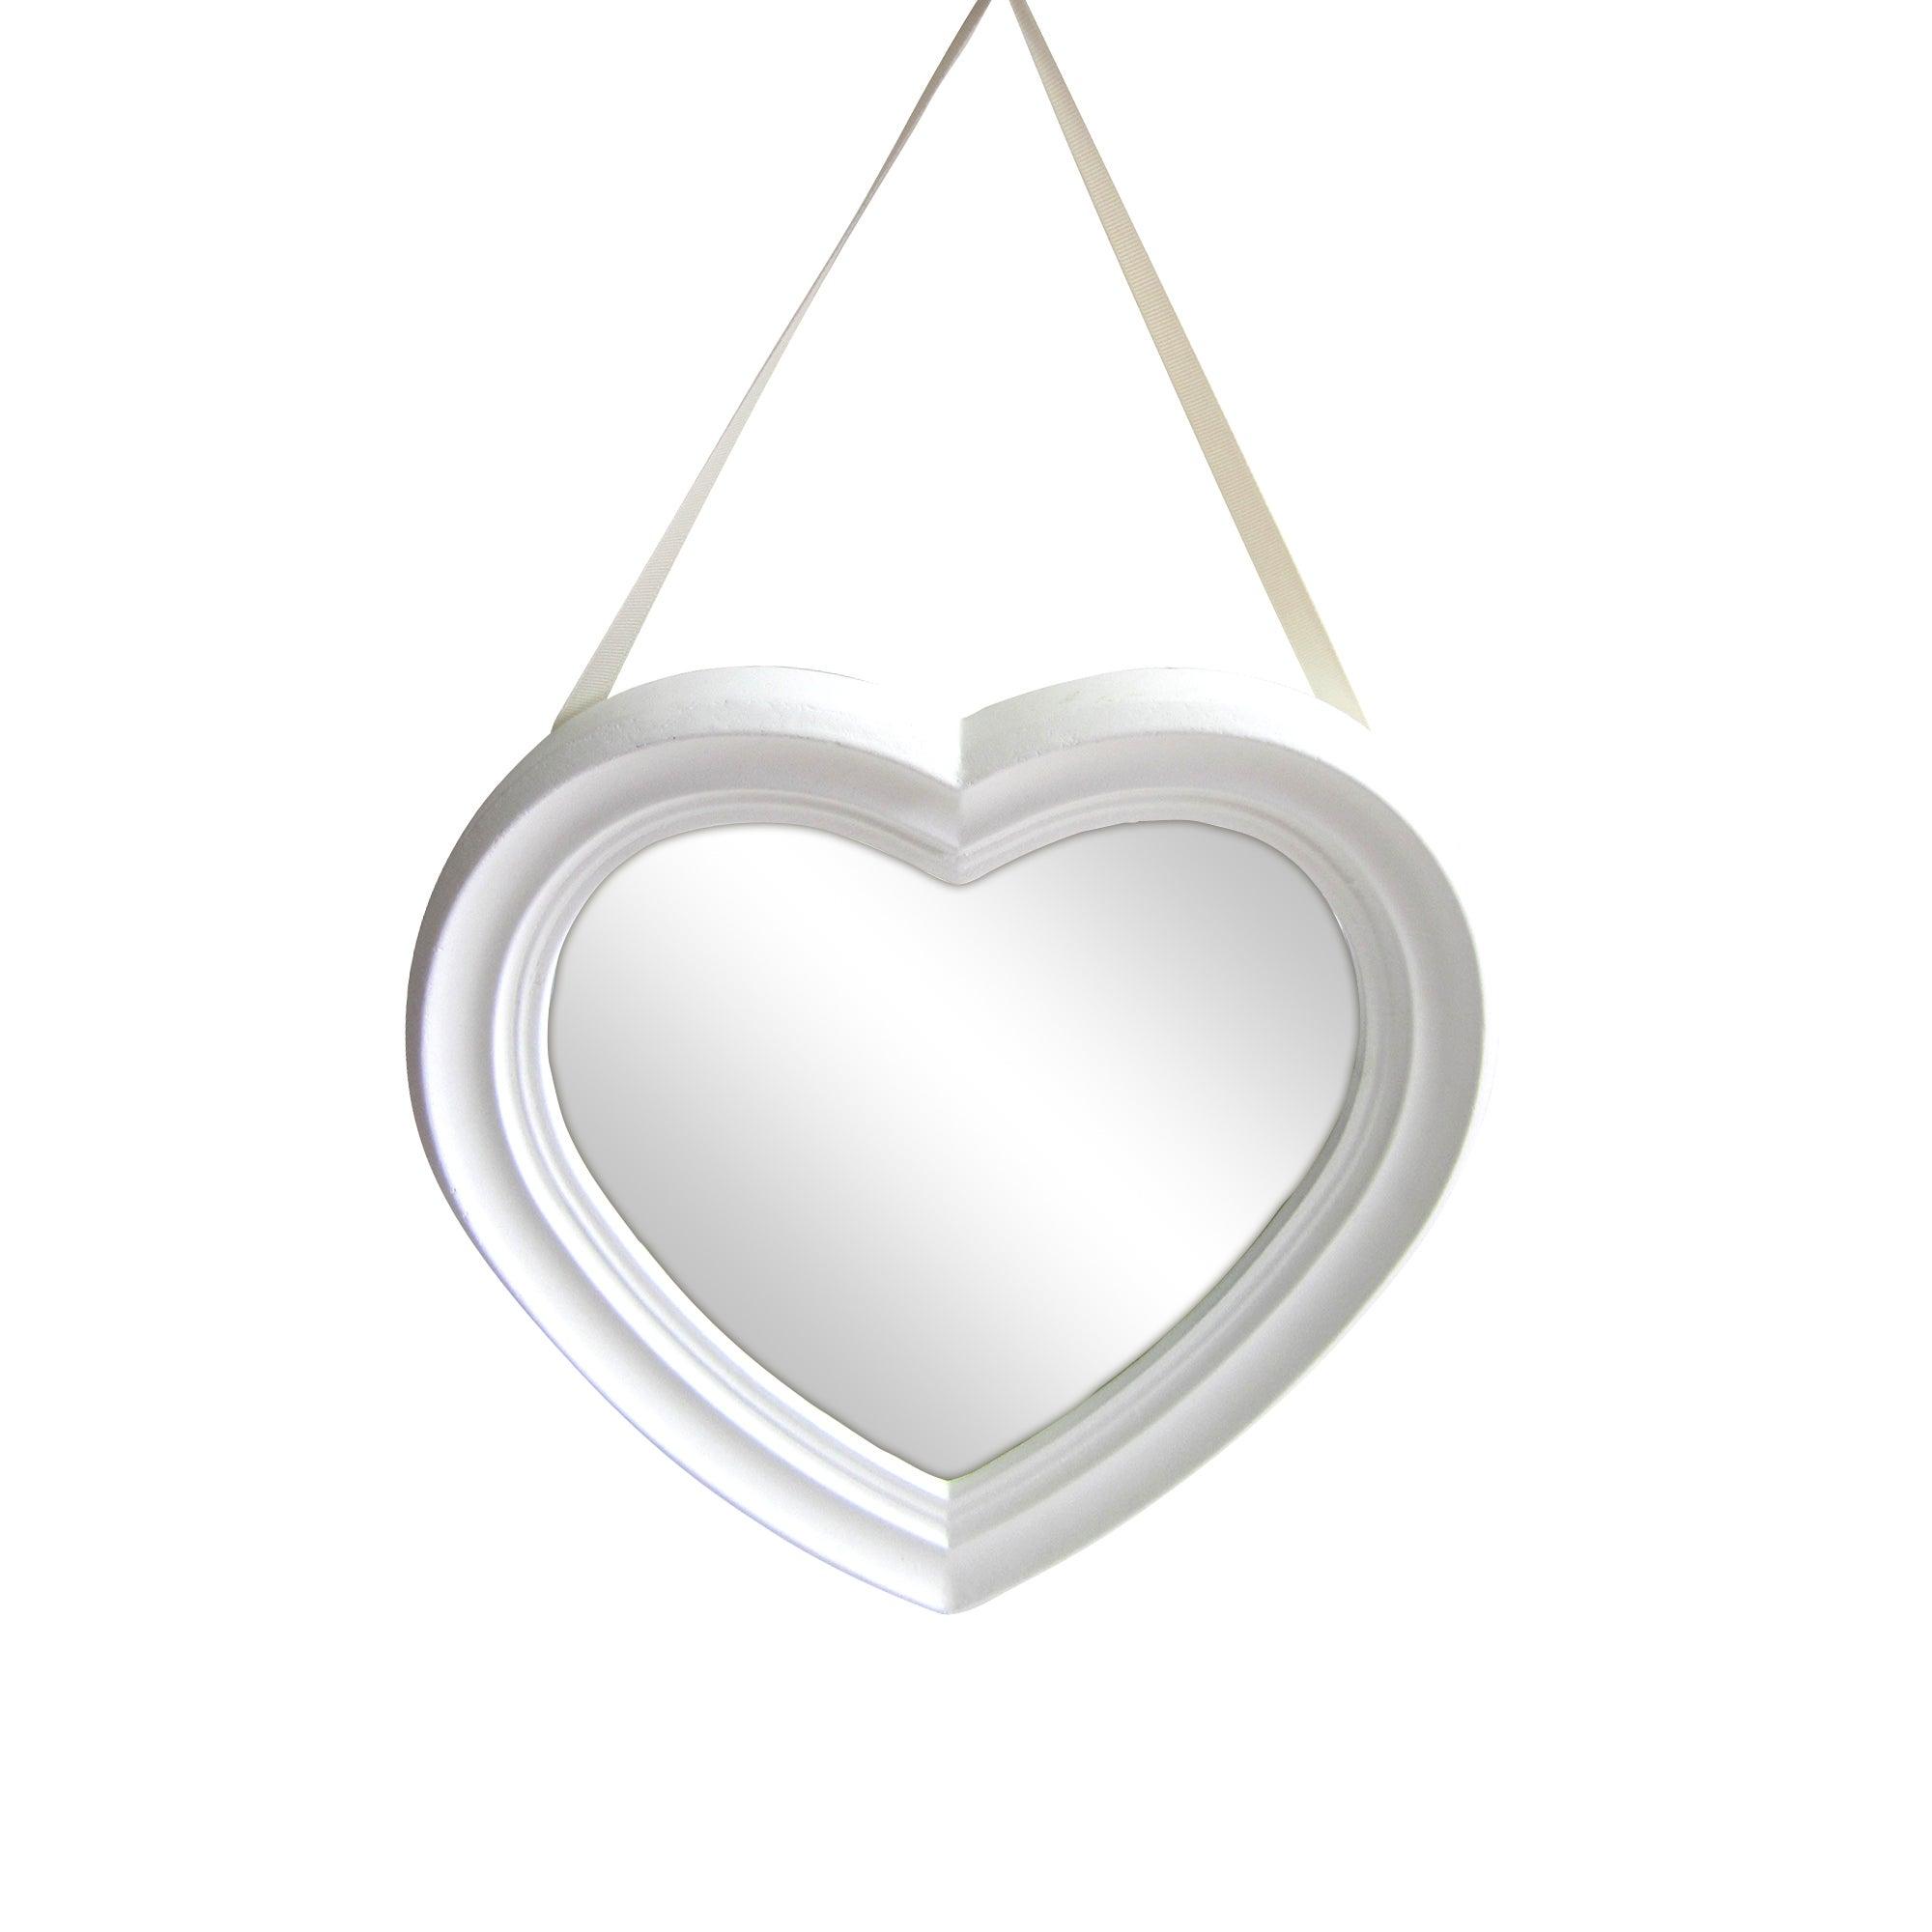 White Heart Shaped Hanging Mirror